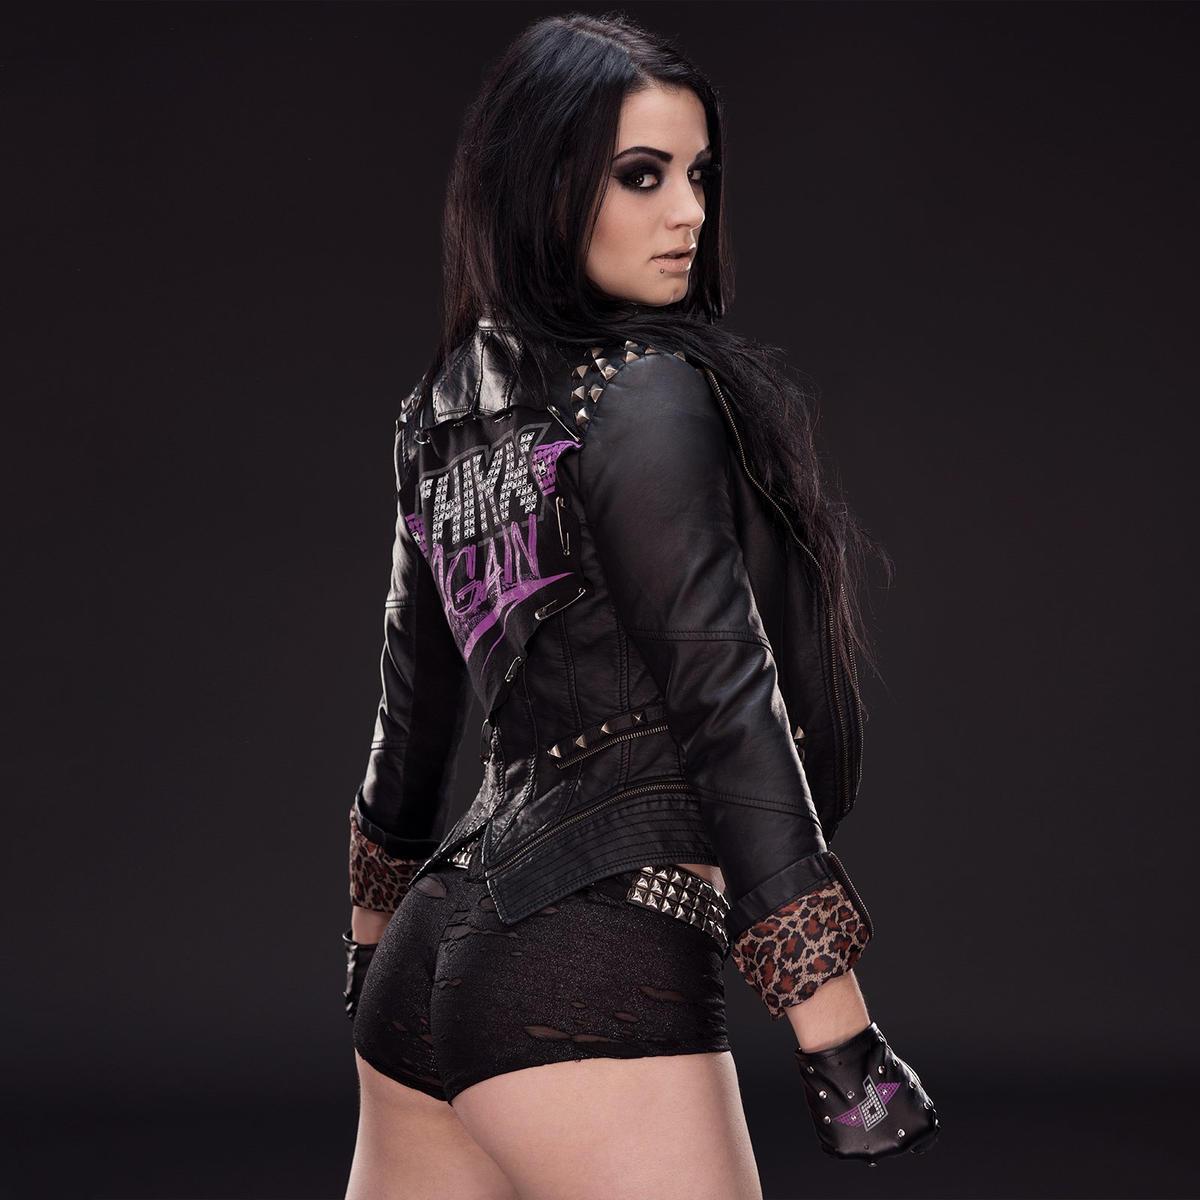 Mandy rose smirfitts speech for Paige diva